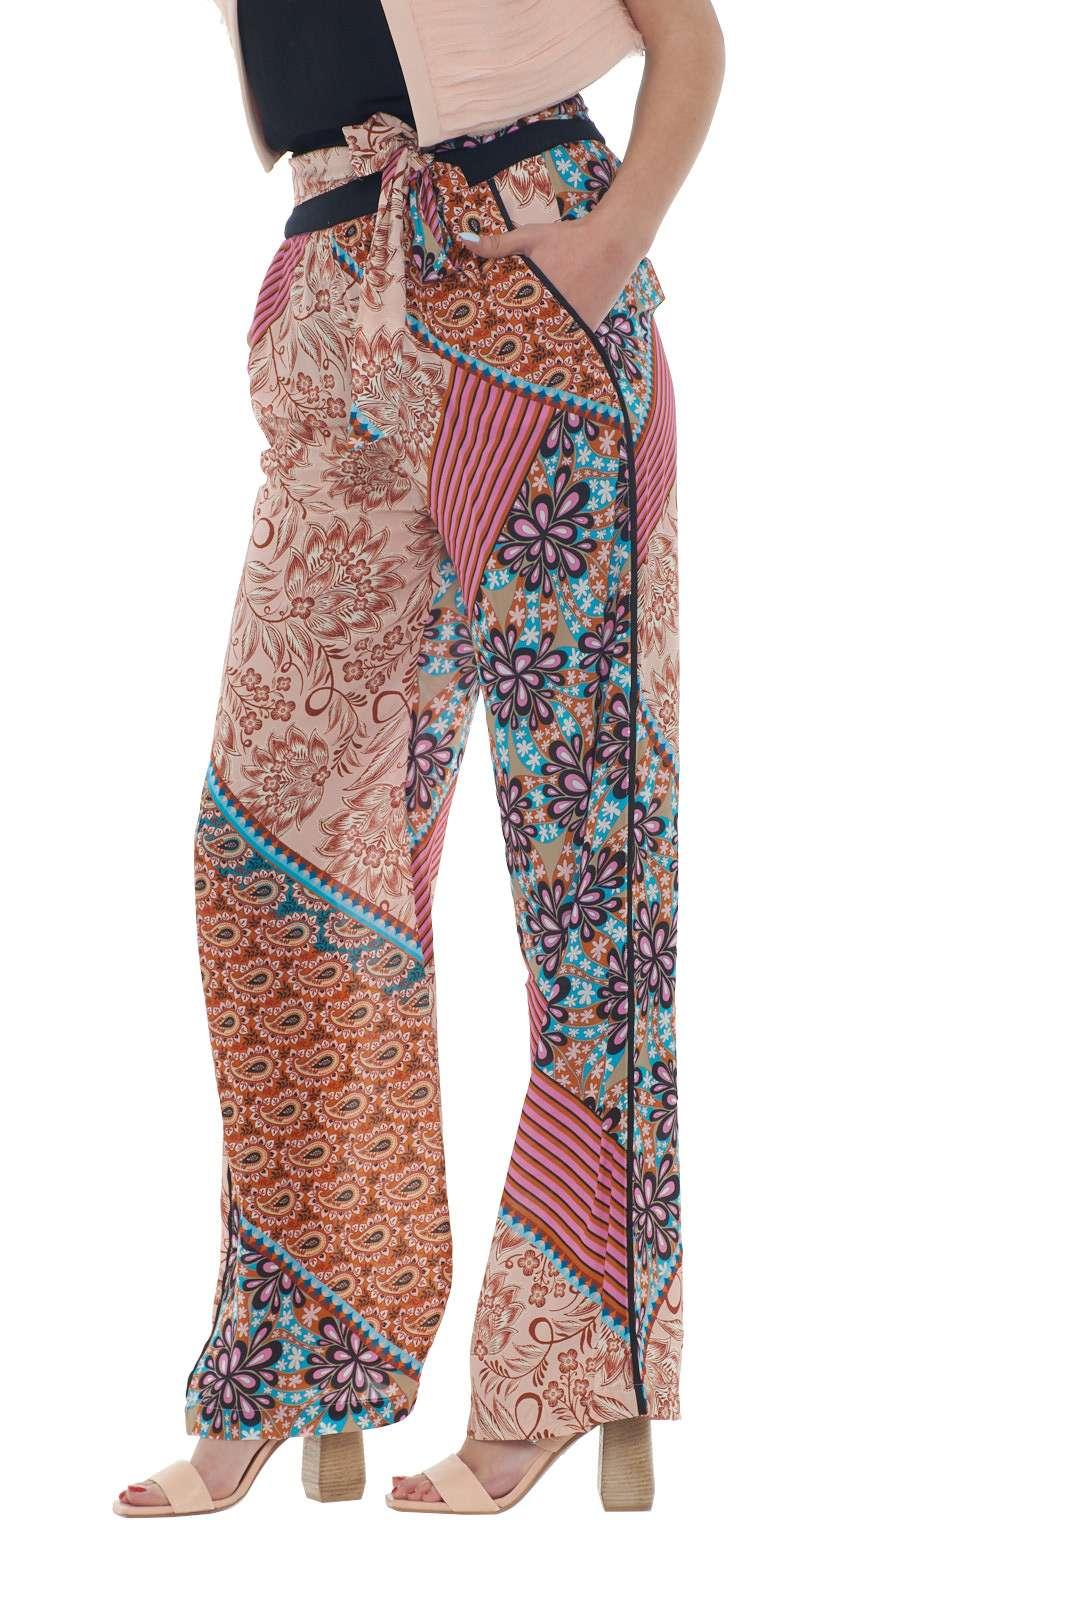 https://www.parmax.com/media/catalog/product/a/i/PE-outlet_parmax-pantaloni-donna-Pinko-1g14uq-B.jpg